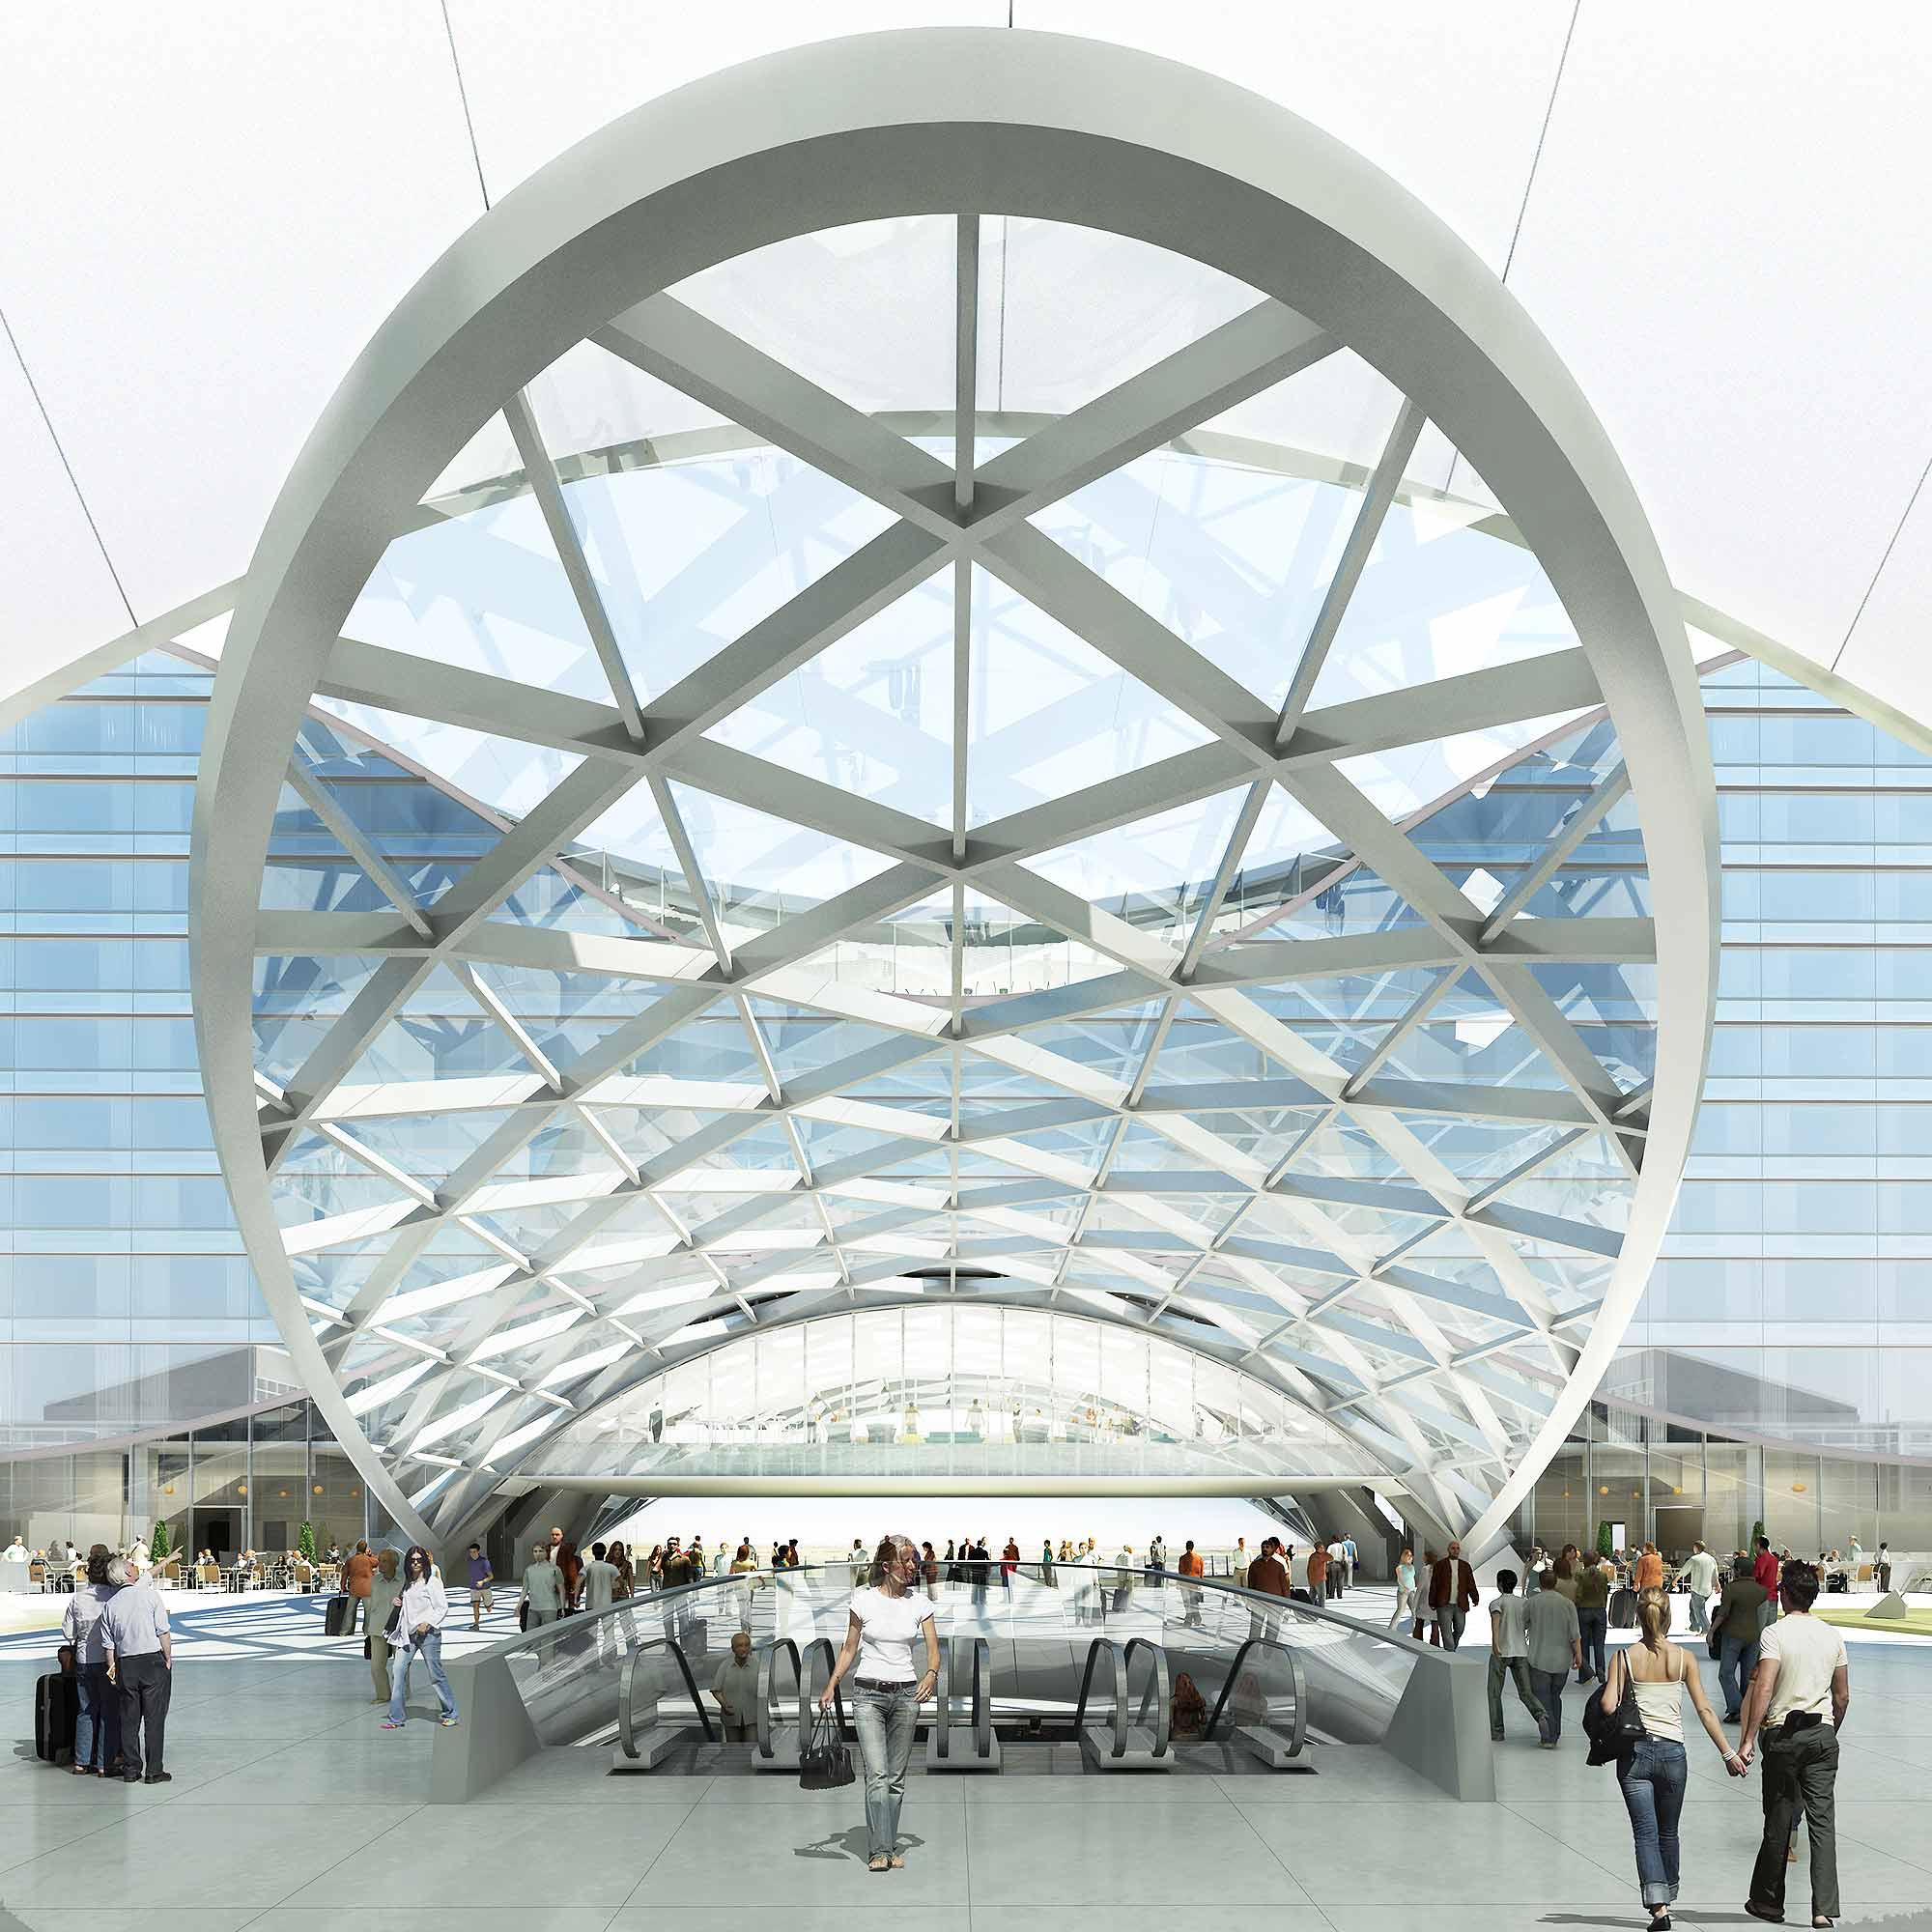 Denver International Airport: Research & Insight